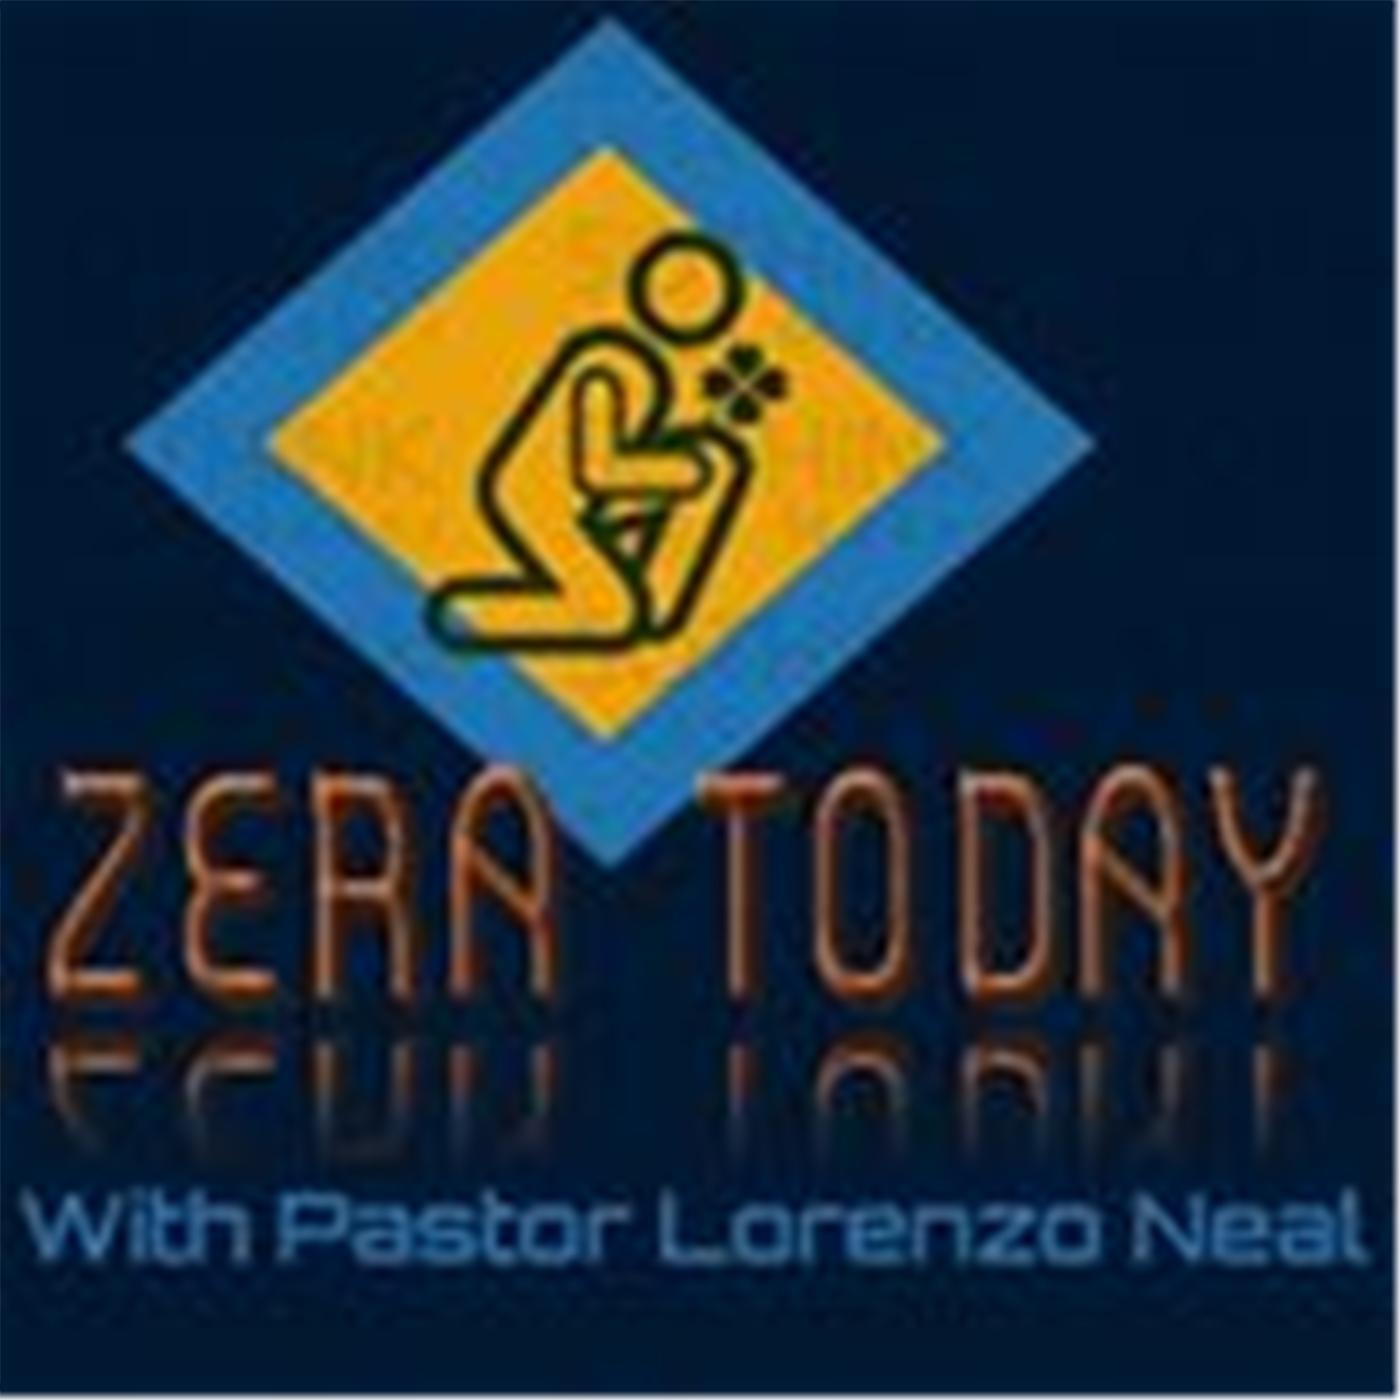 Zera Today with Dr. Lorenzo Neal